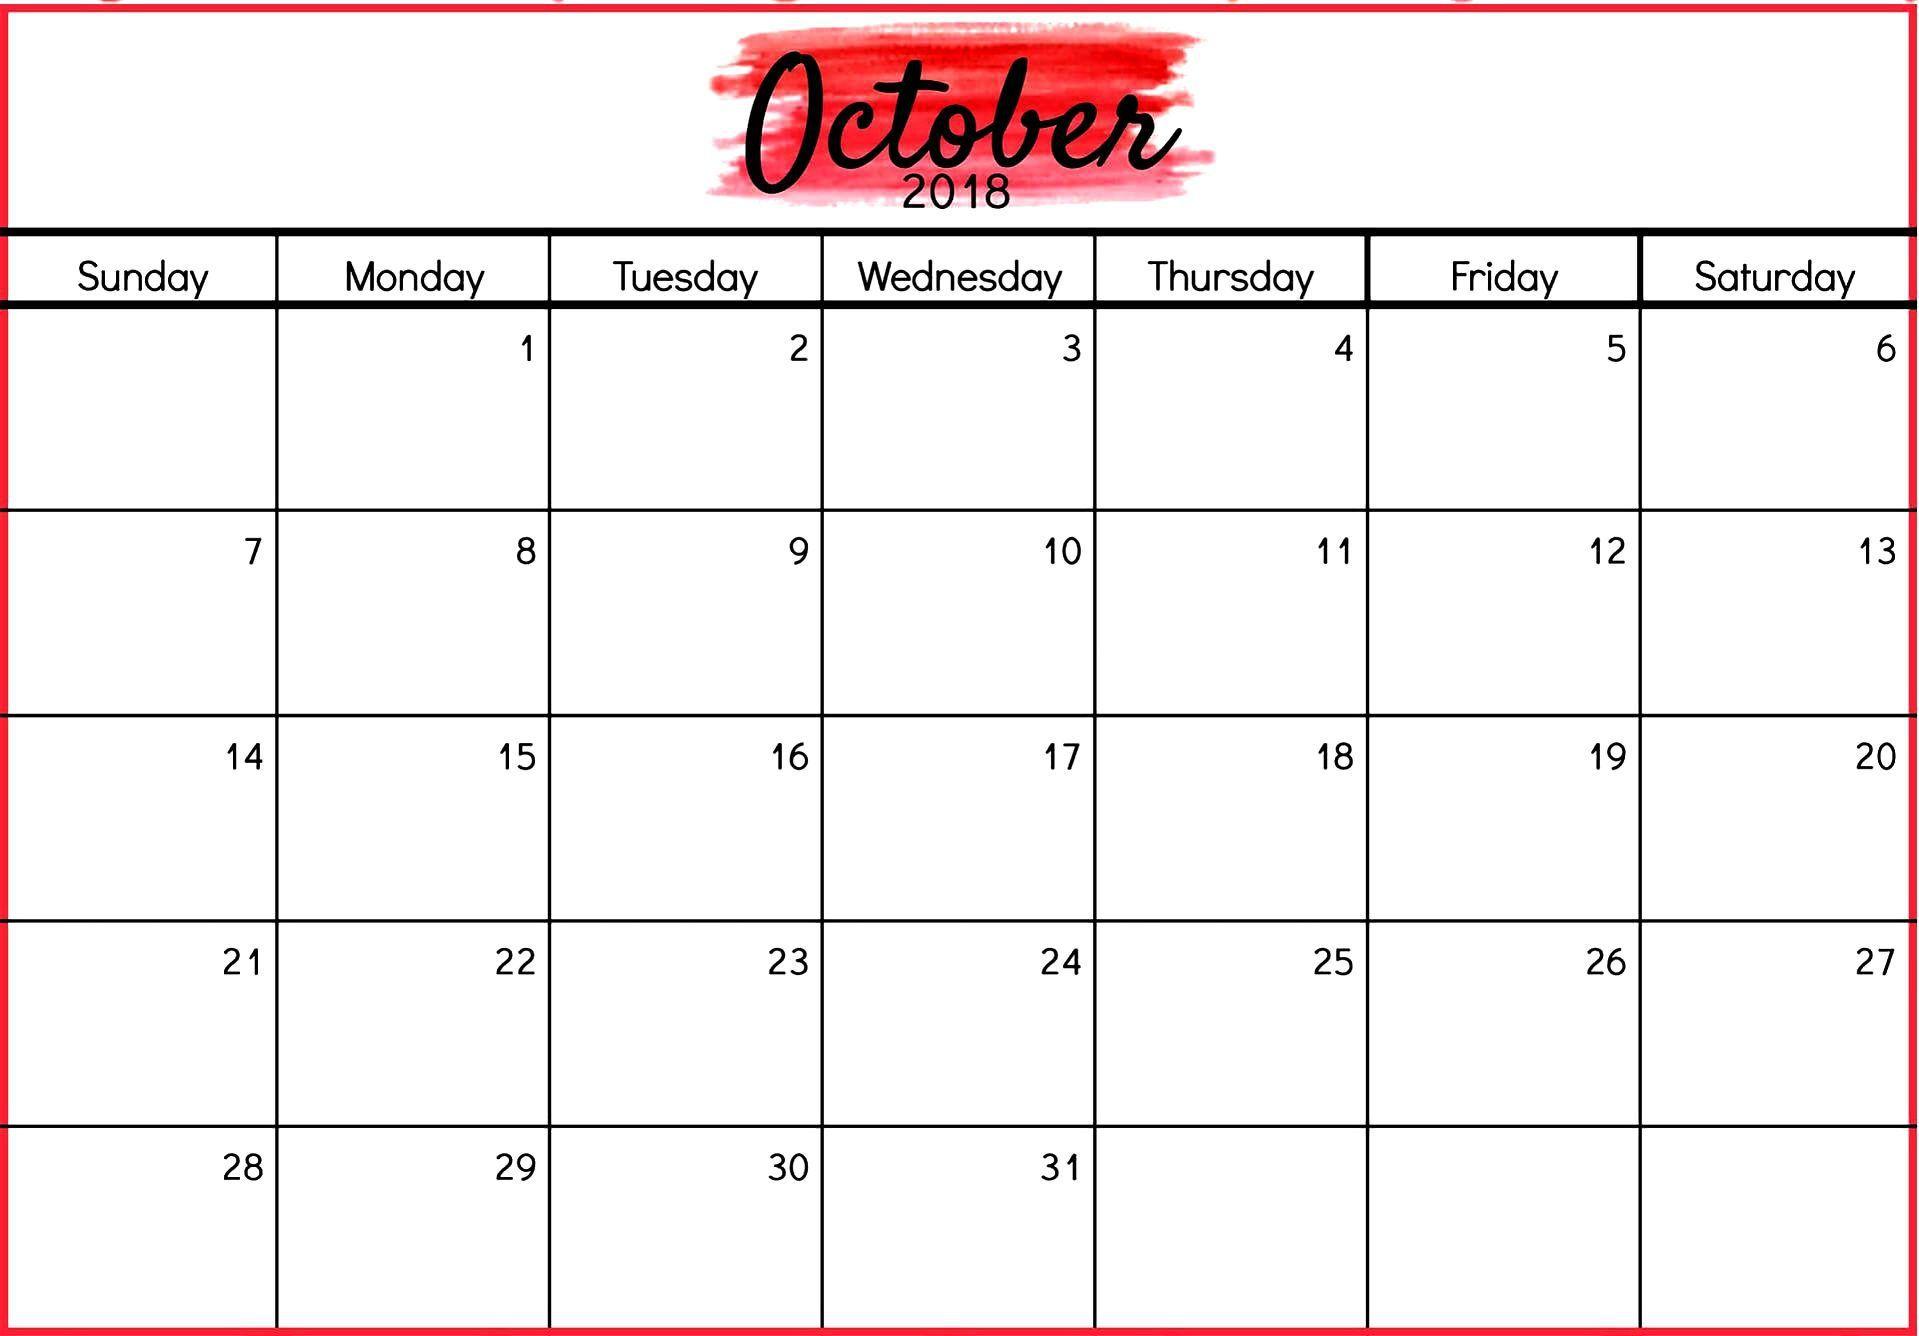 002 Fantastic Calendar Template October 2018 Word High Resolution Full